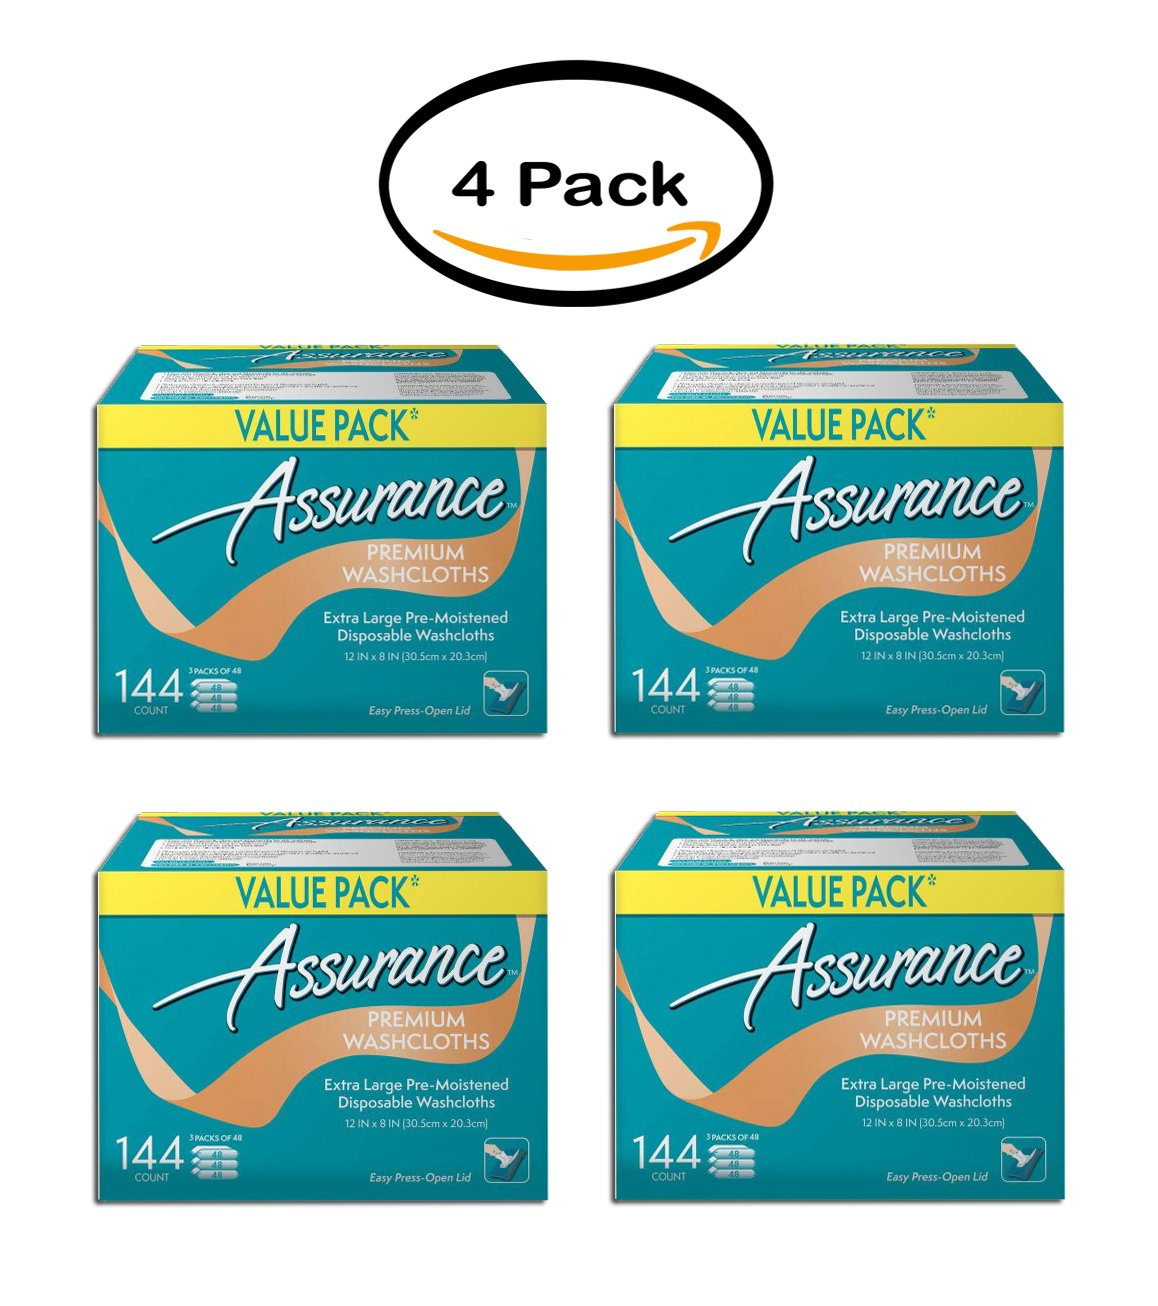 PACK OF 4 - Assurance premium washcloths, XL, 144 Ct